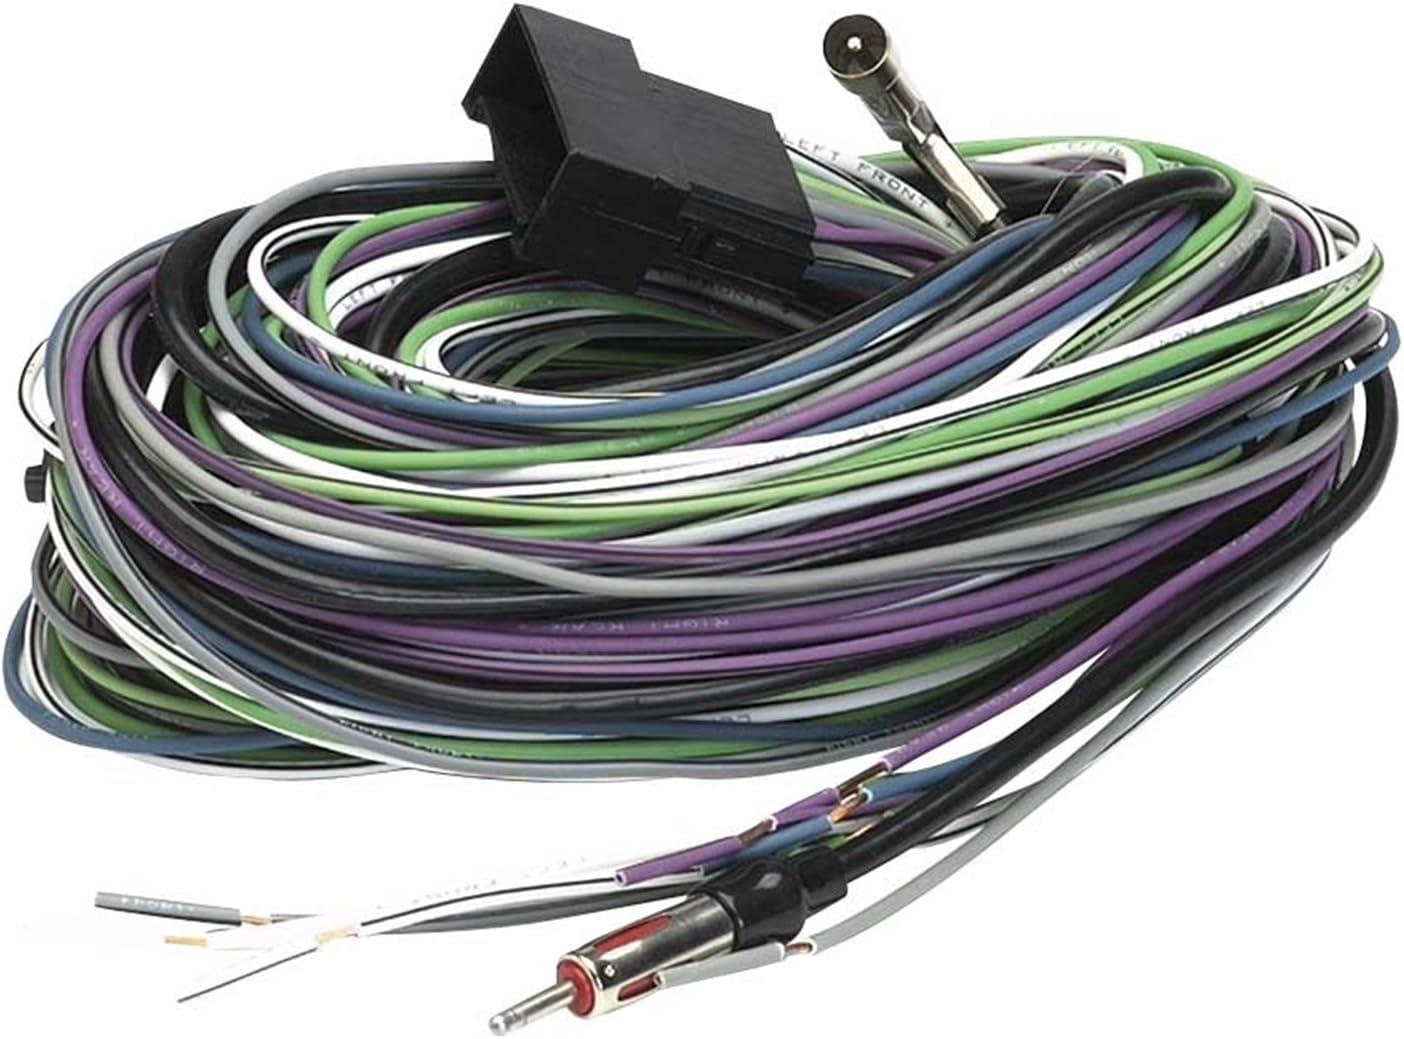 99 ford taurus stereo wiring 2002 ford taurus wiring harness kits kobe balmoond17  2002 ford taurus wiring harness kits